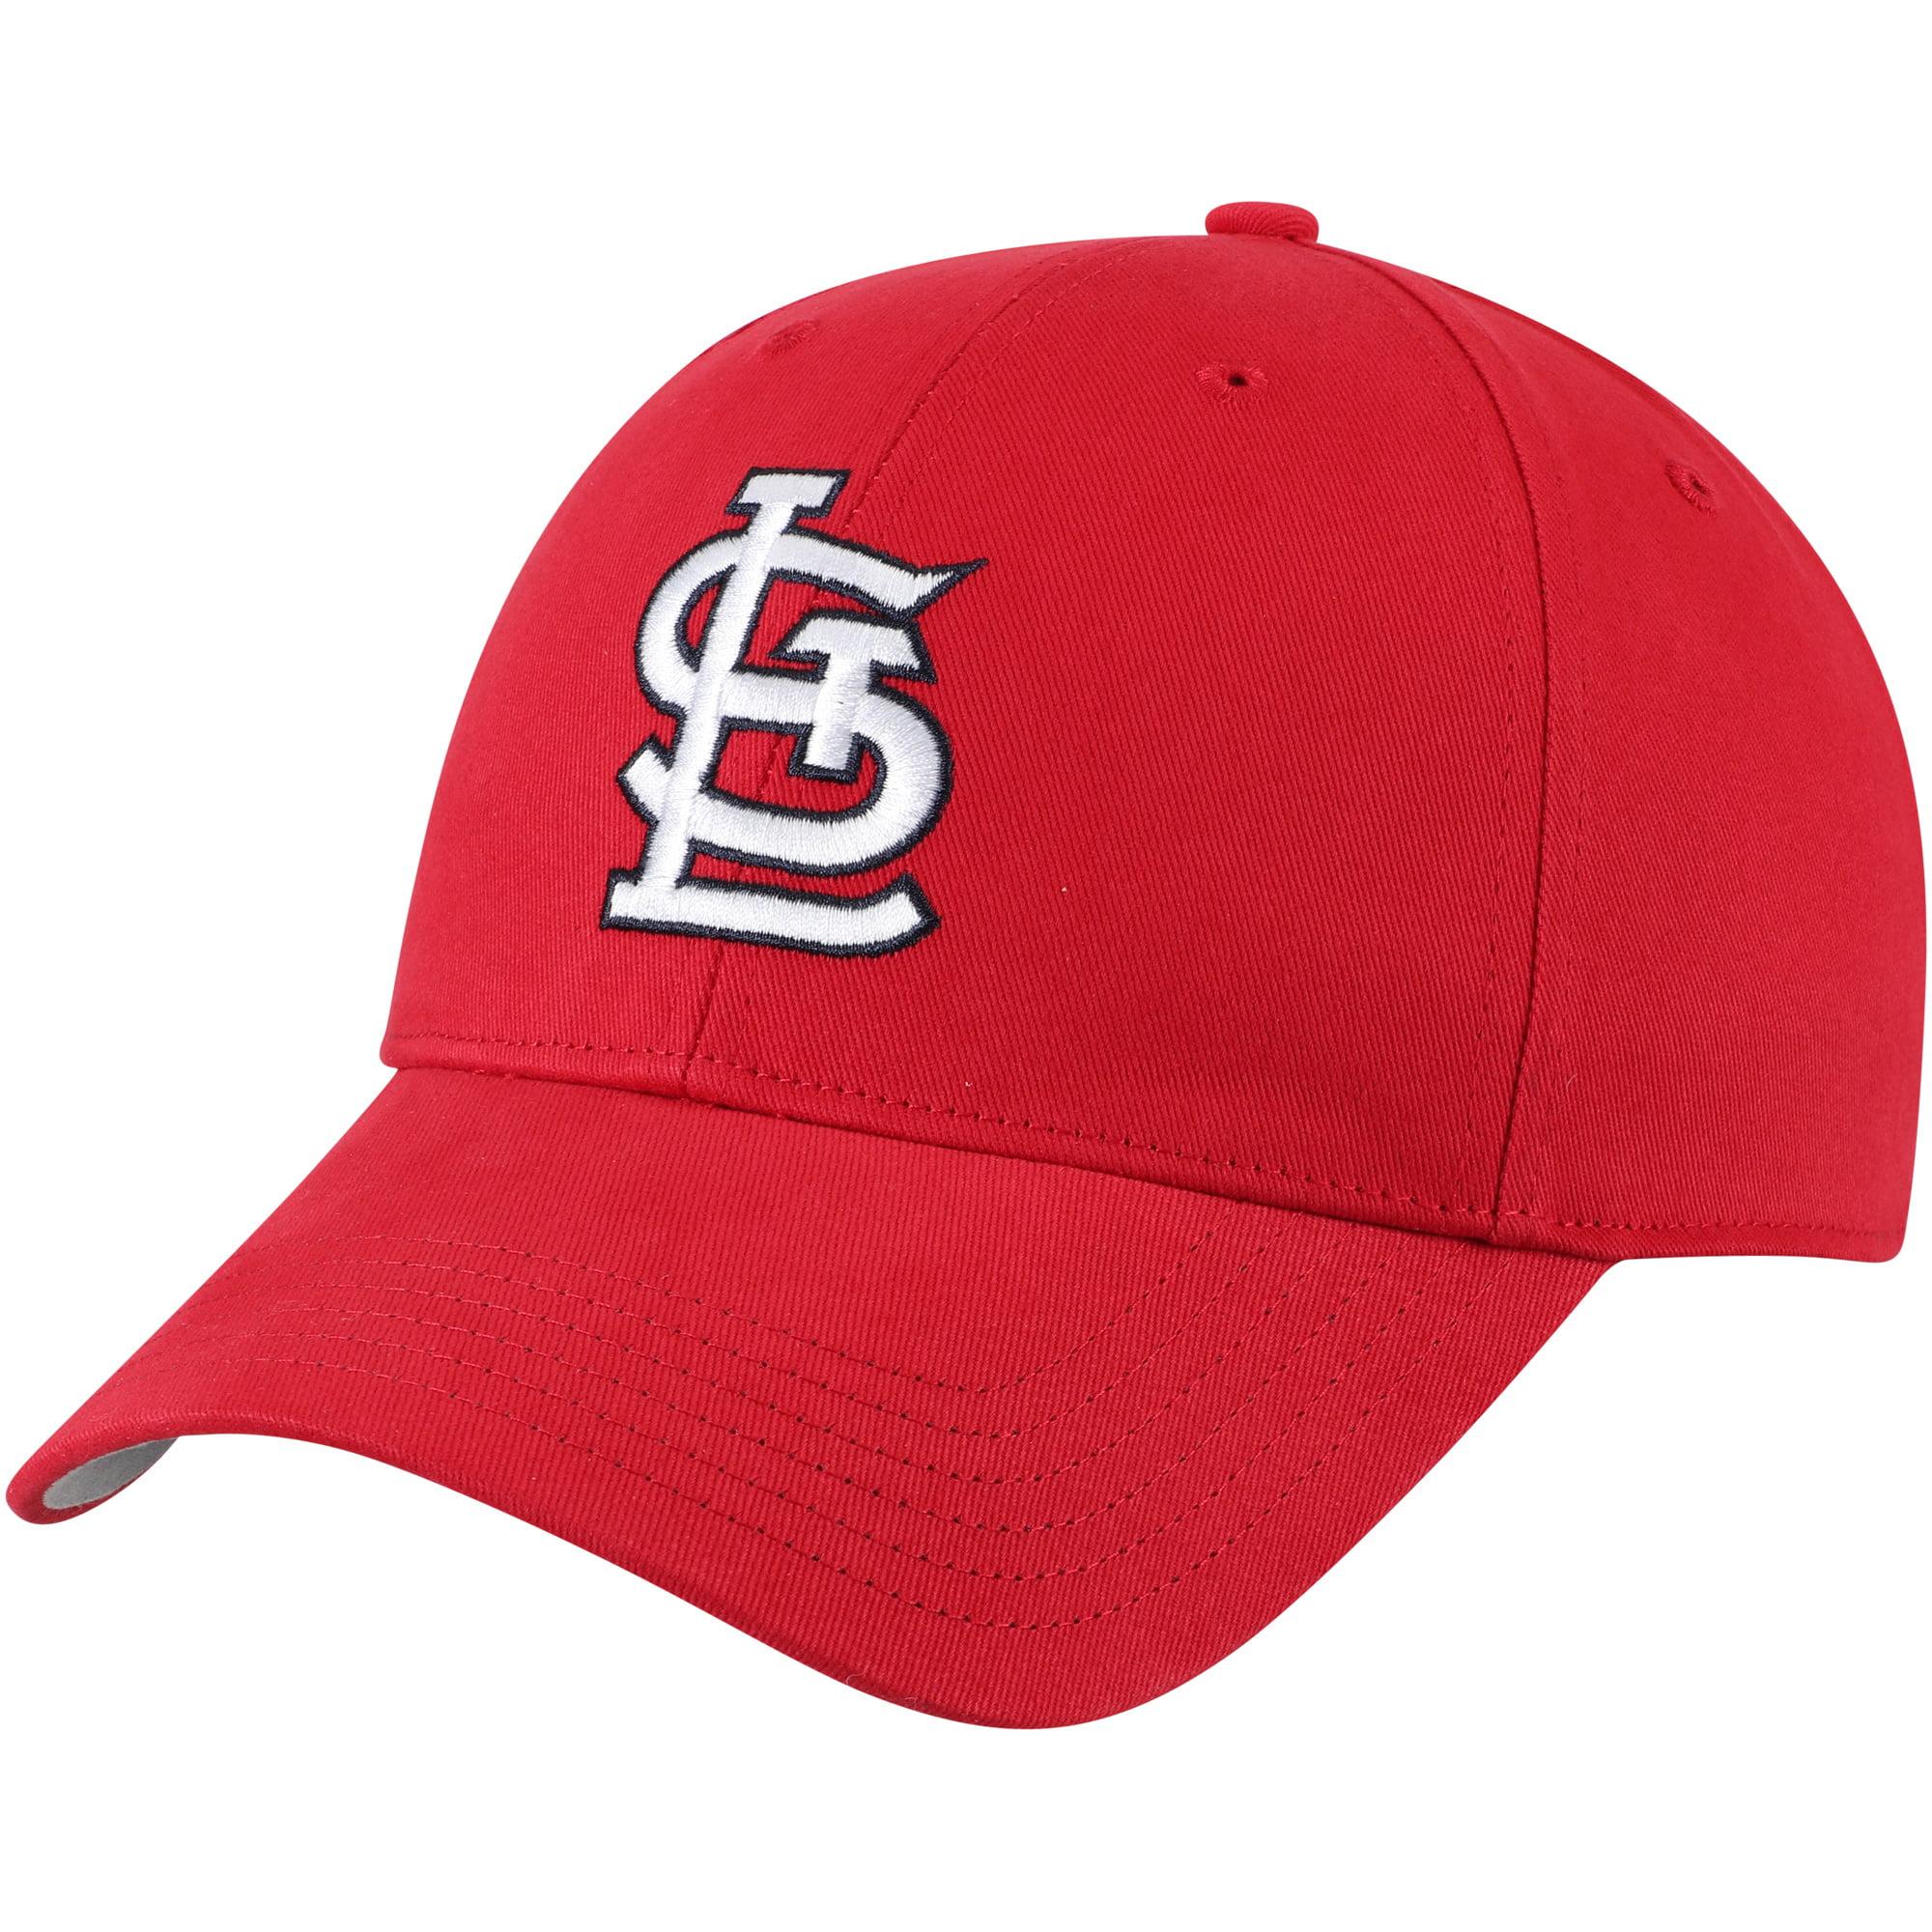 St. Louis Cardinals Fan Favorite Basic Adjustable Hat - Red - OSFA